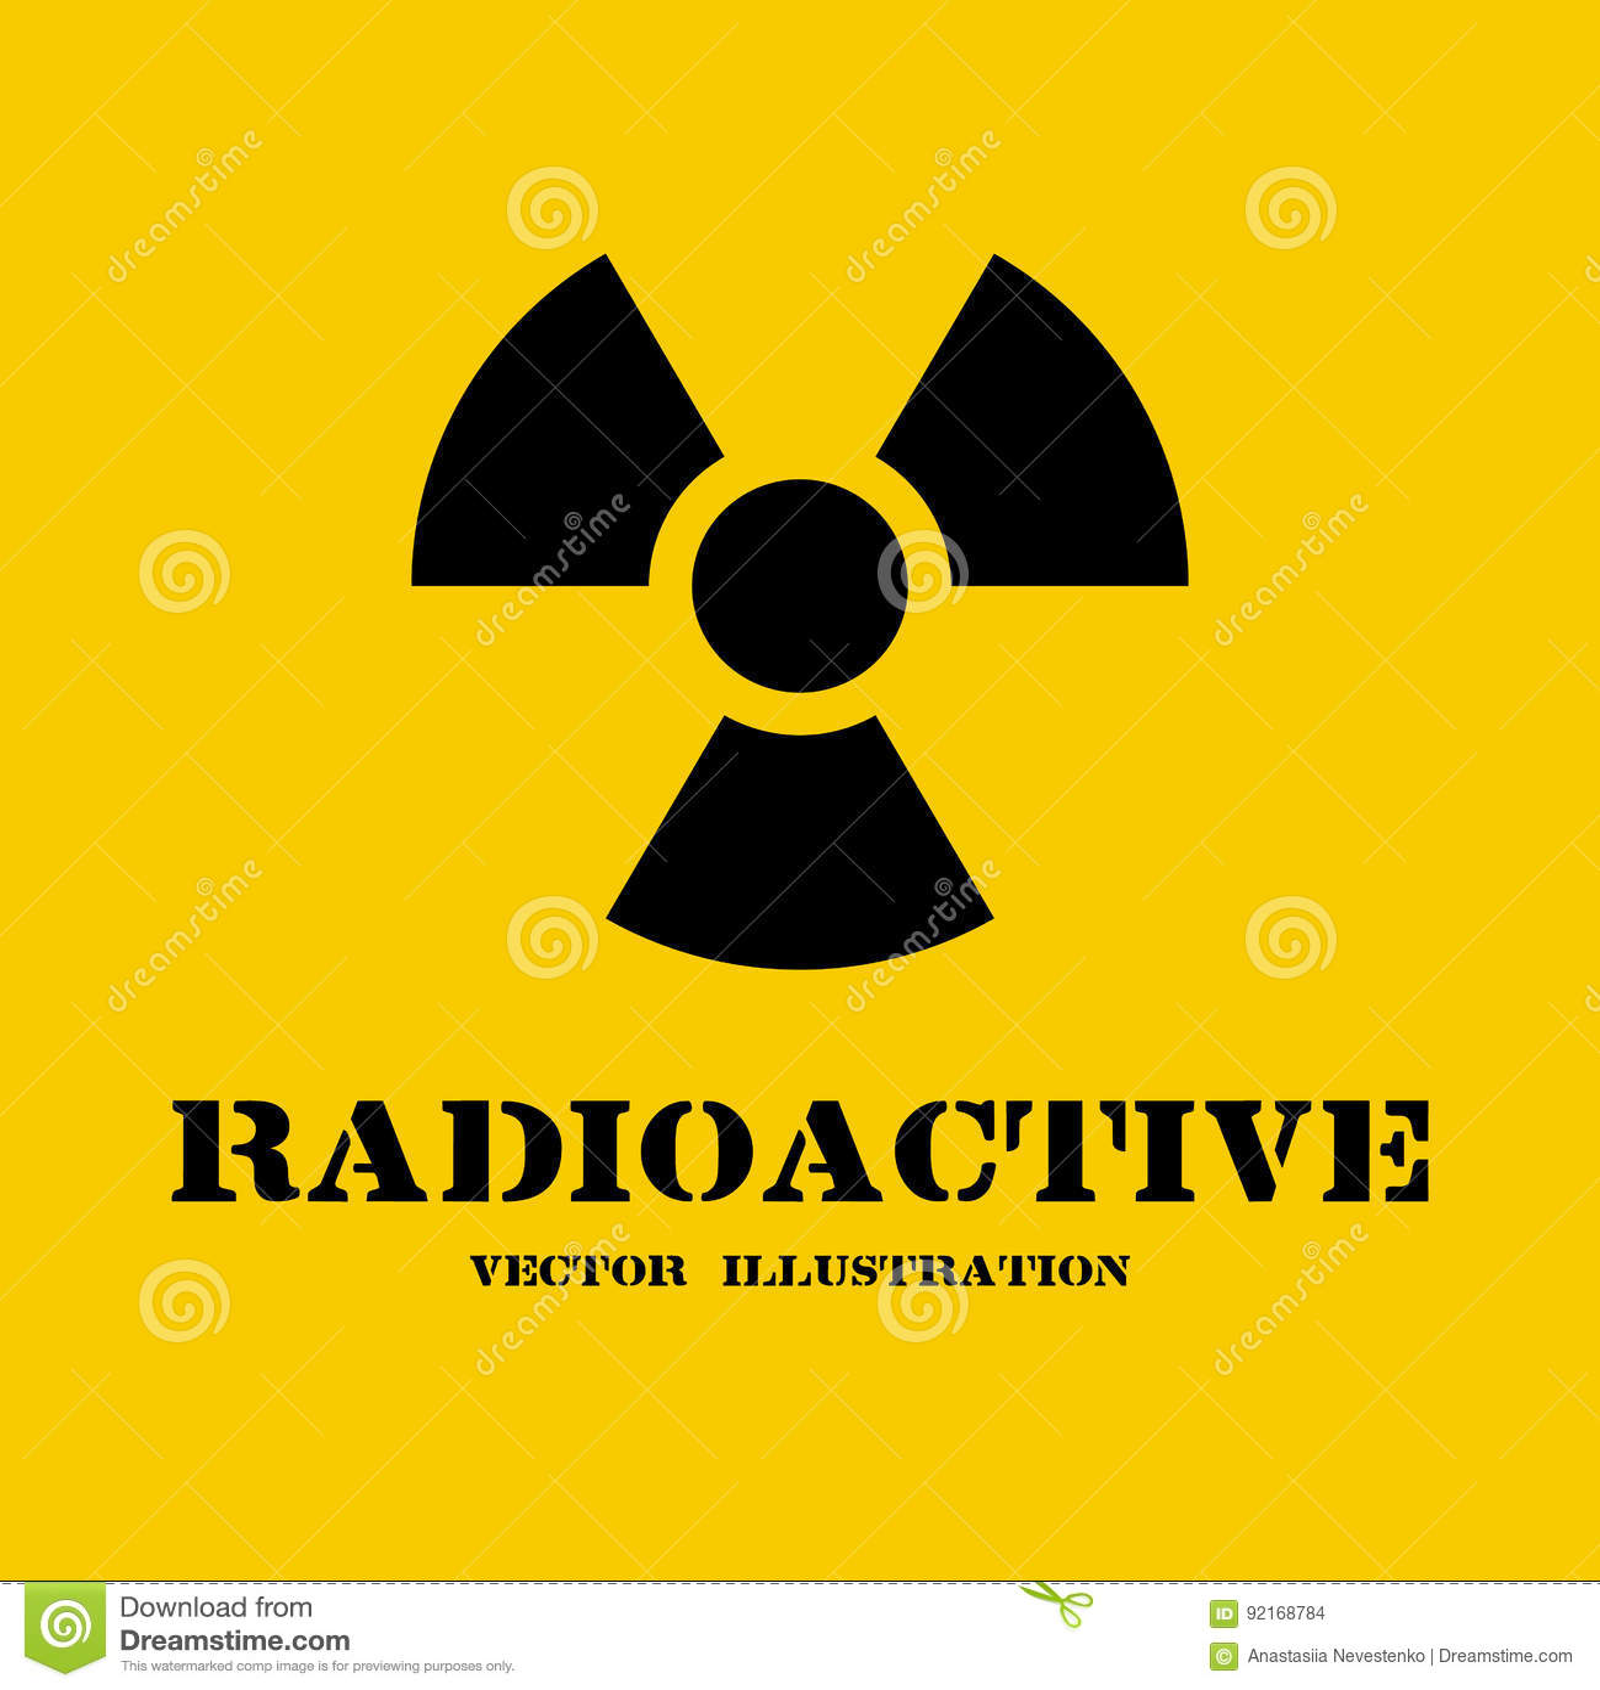 Radioactive symbol text gallery symbol and sign ideas radioactive symbol isolated stock vector illustration of atomic radioactive symbol isolated buycottarizona buycottarizona